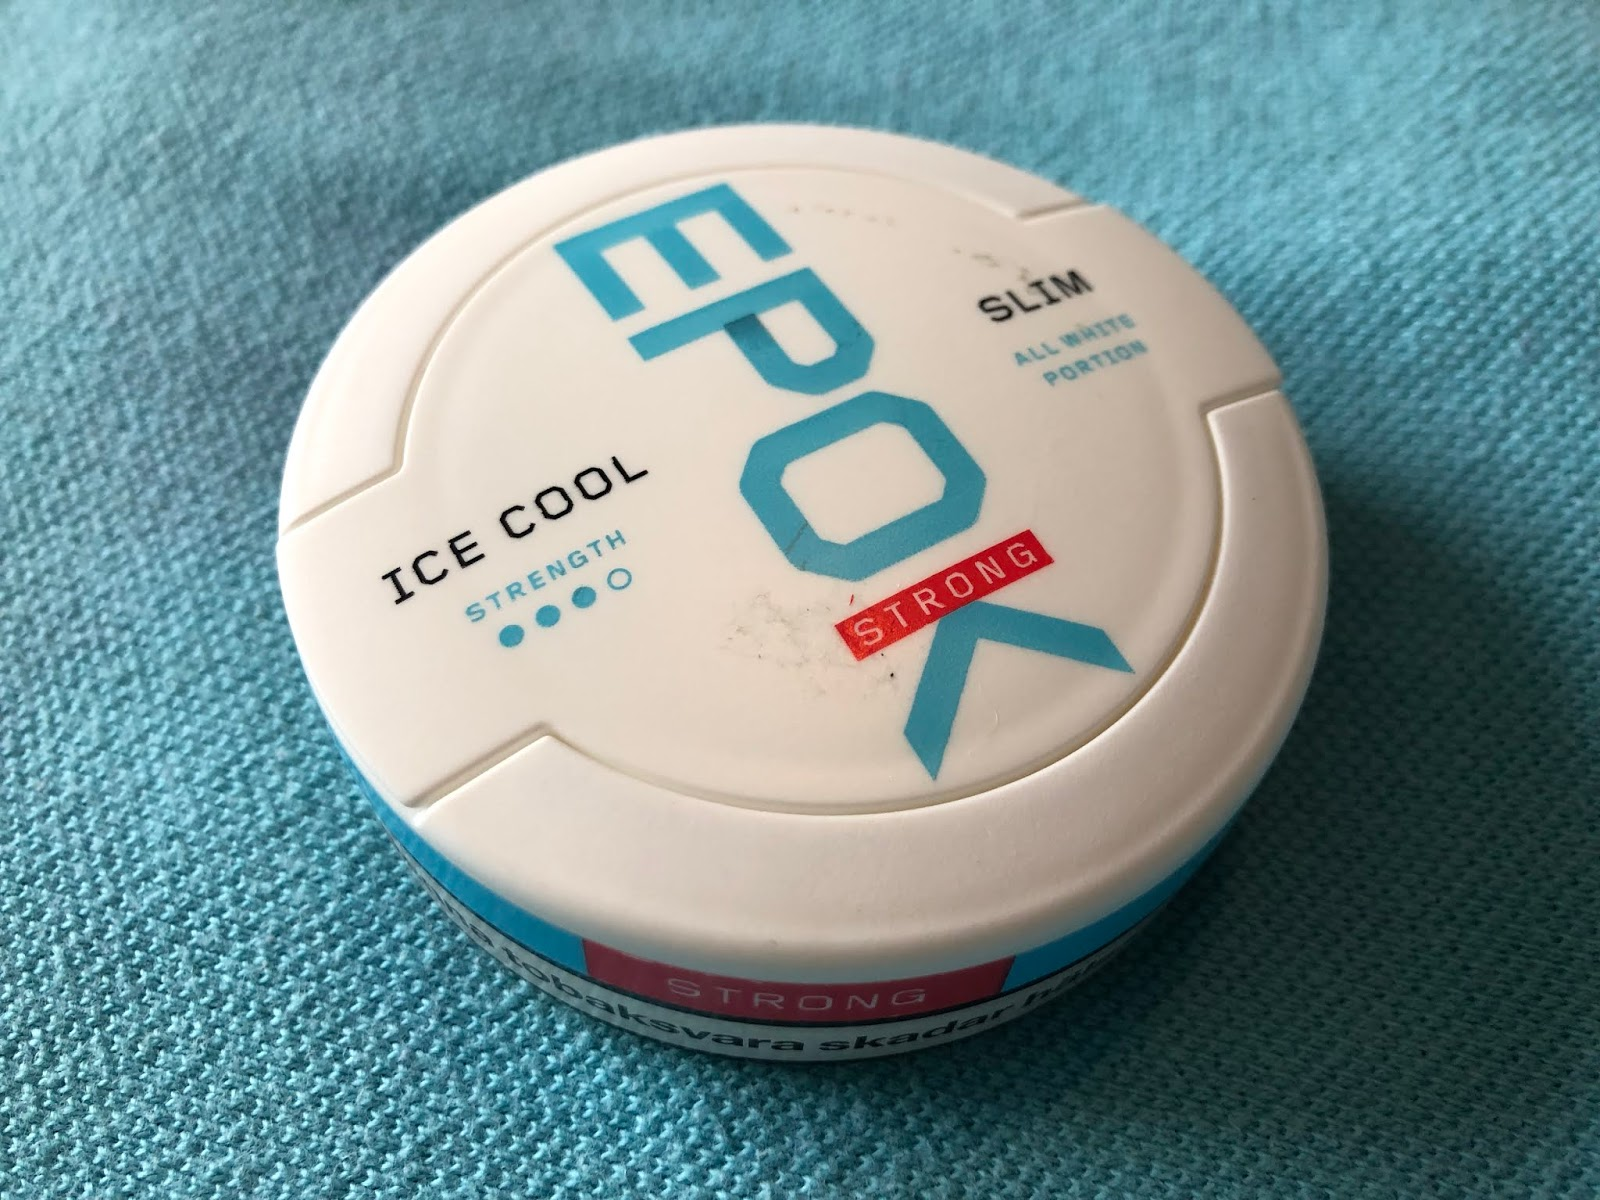 38f620d77dd4 Snubie.com  Epok Ice Cool Mint (Strong) - Review. 8 June 2016.